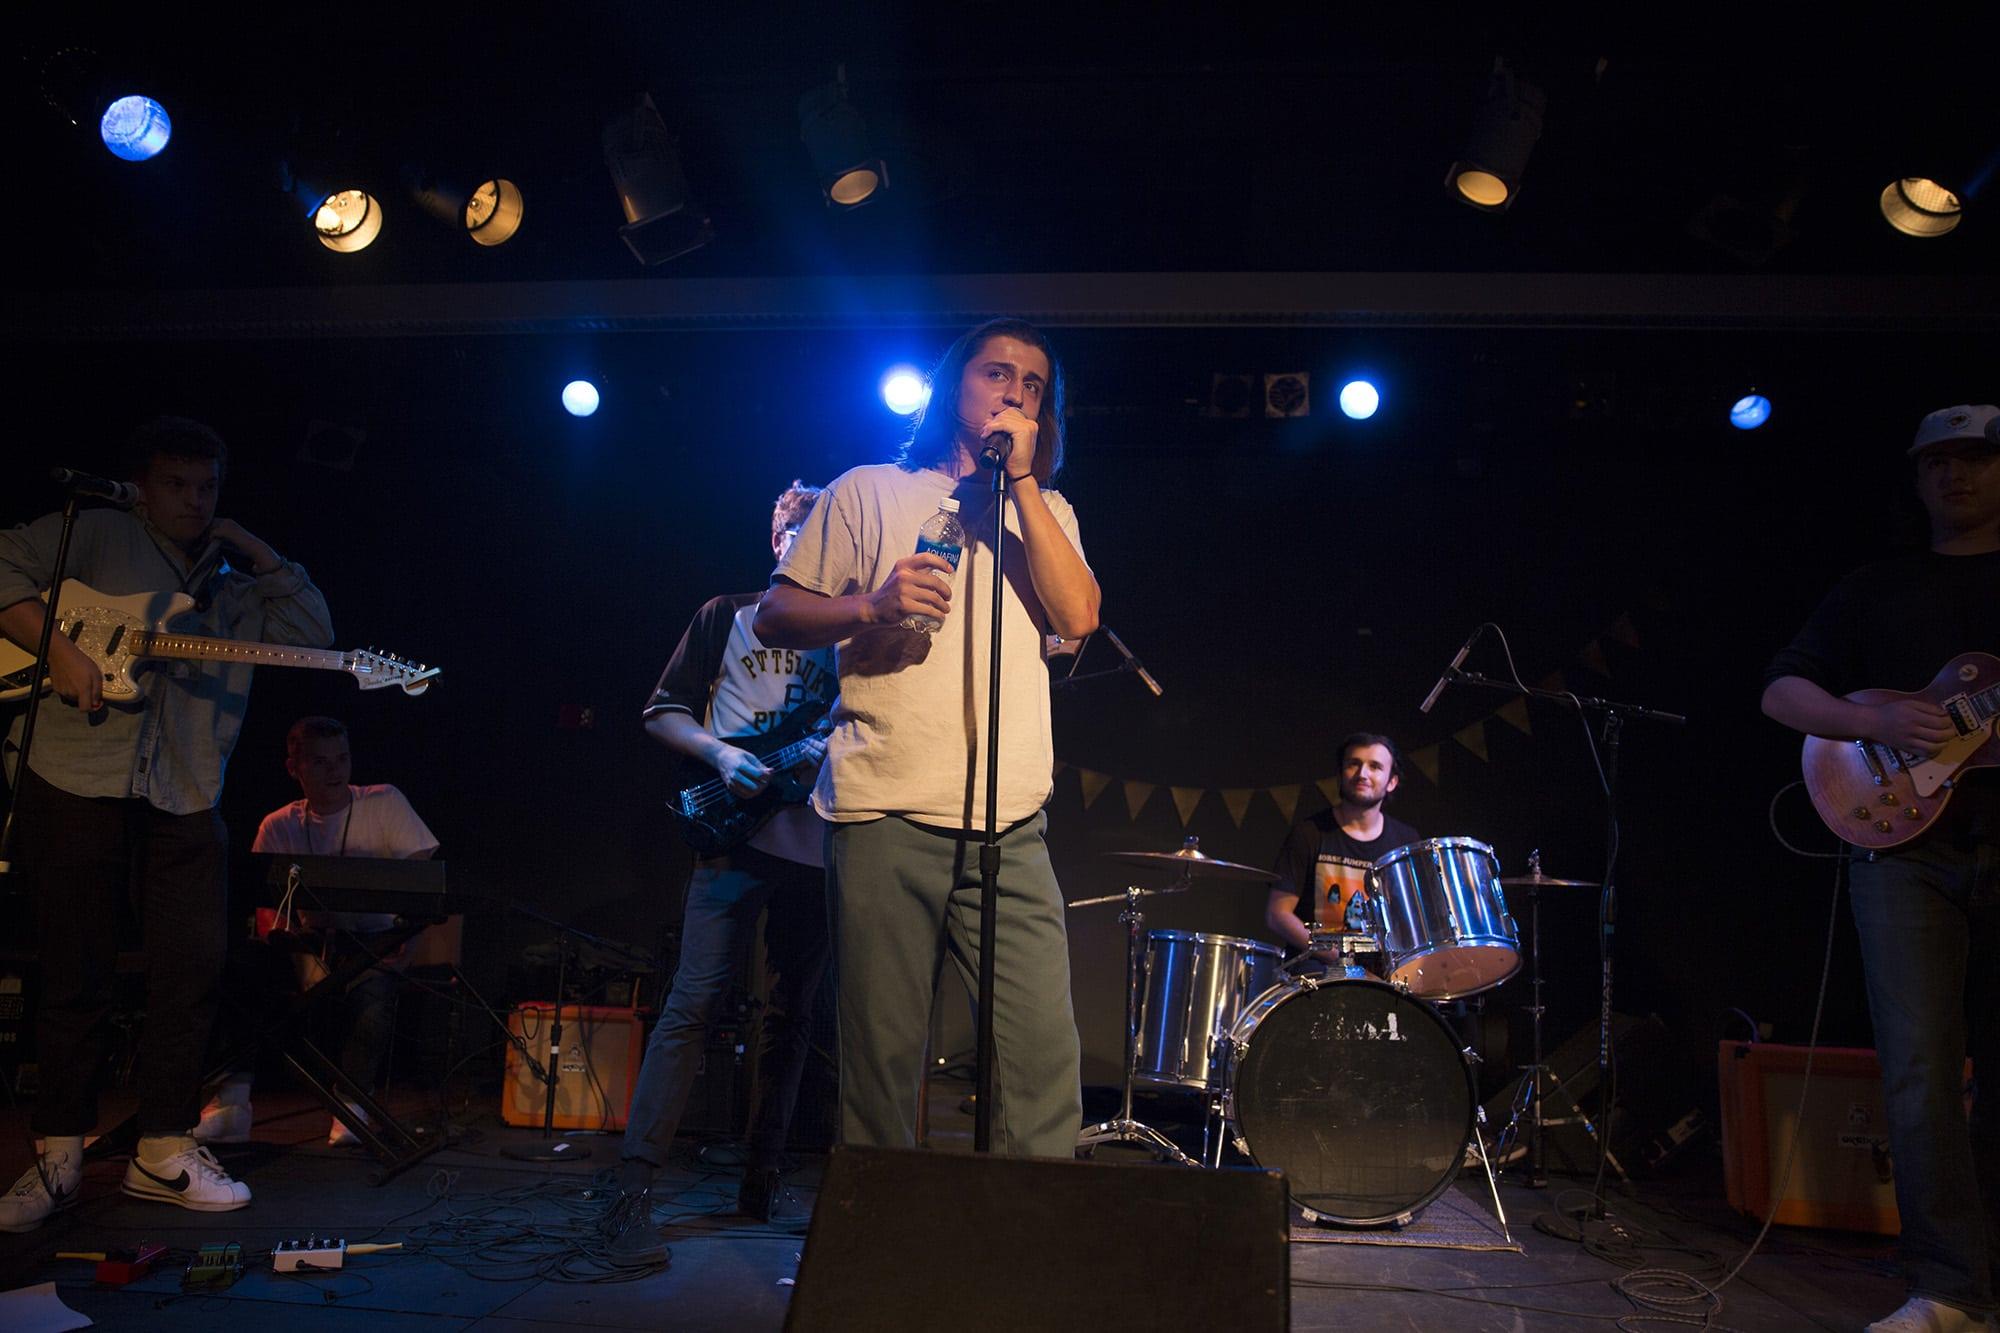 The Wisconaut Performing at Schine Underground, Syracuse University. 09/28/17